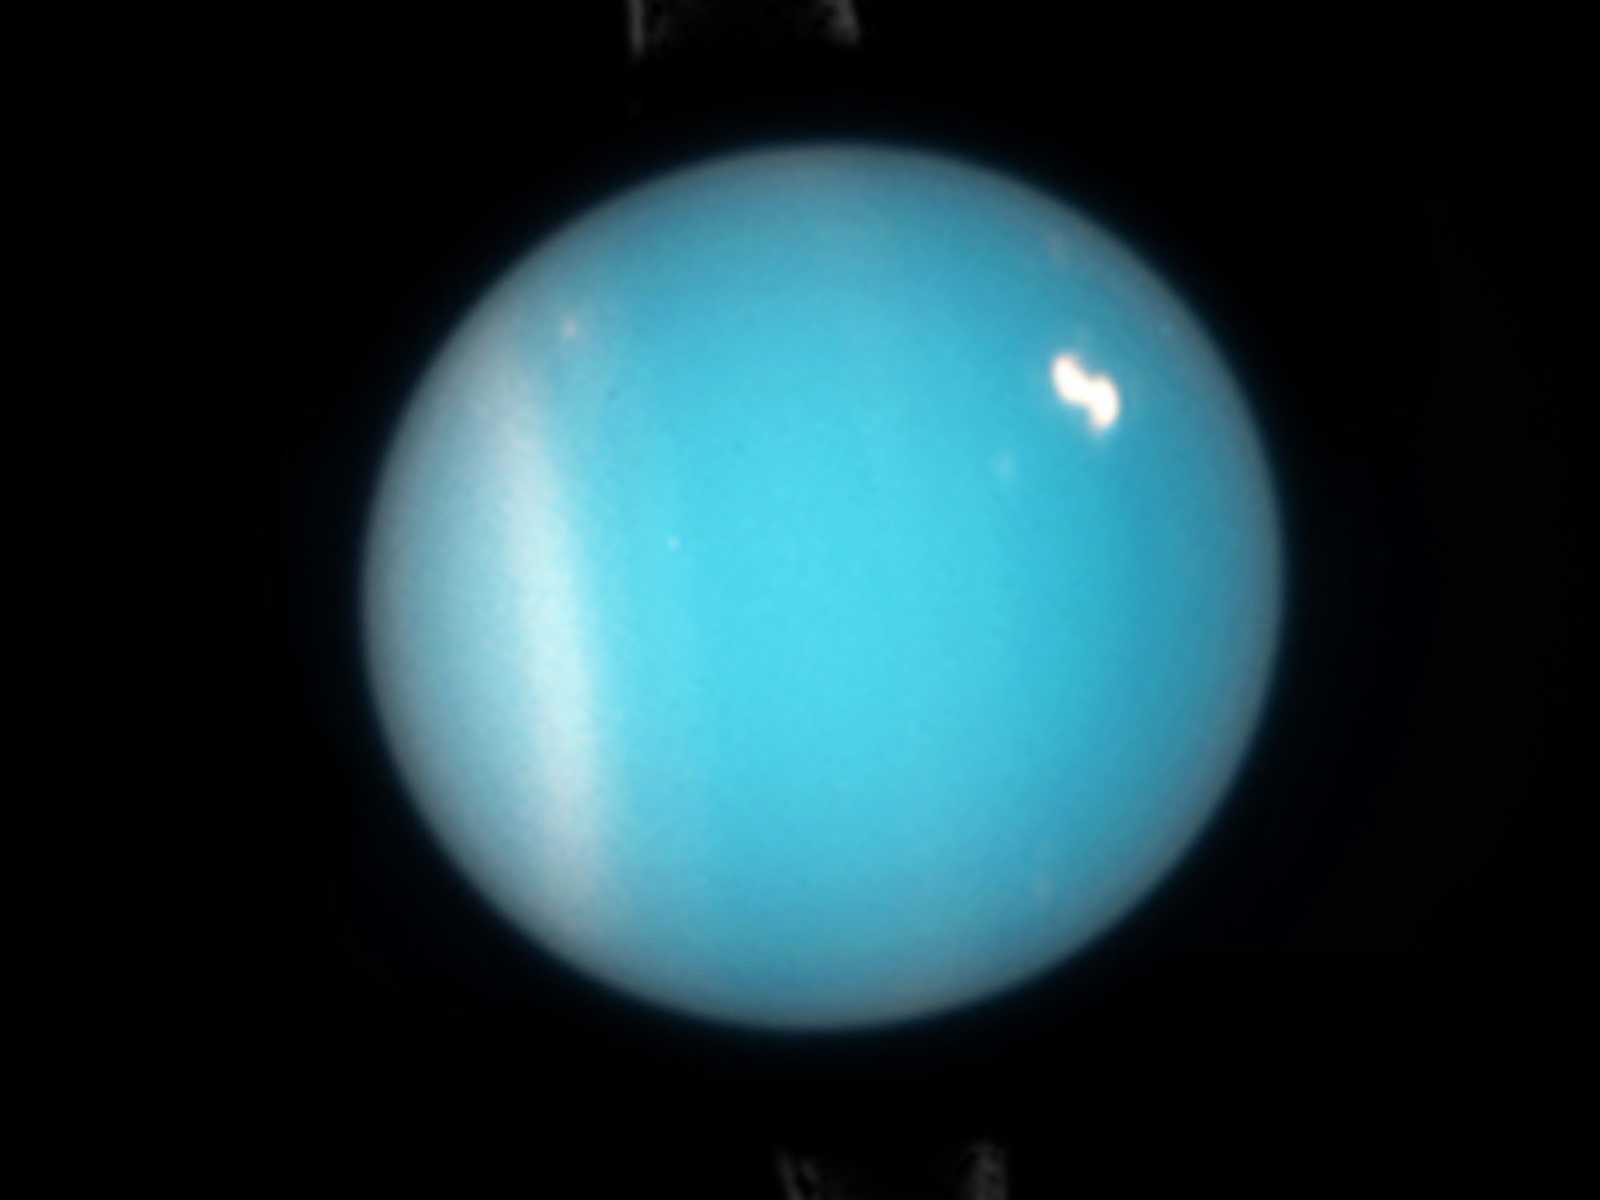 Planet Uranus Wallpaper (page 2) - Pics about space